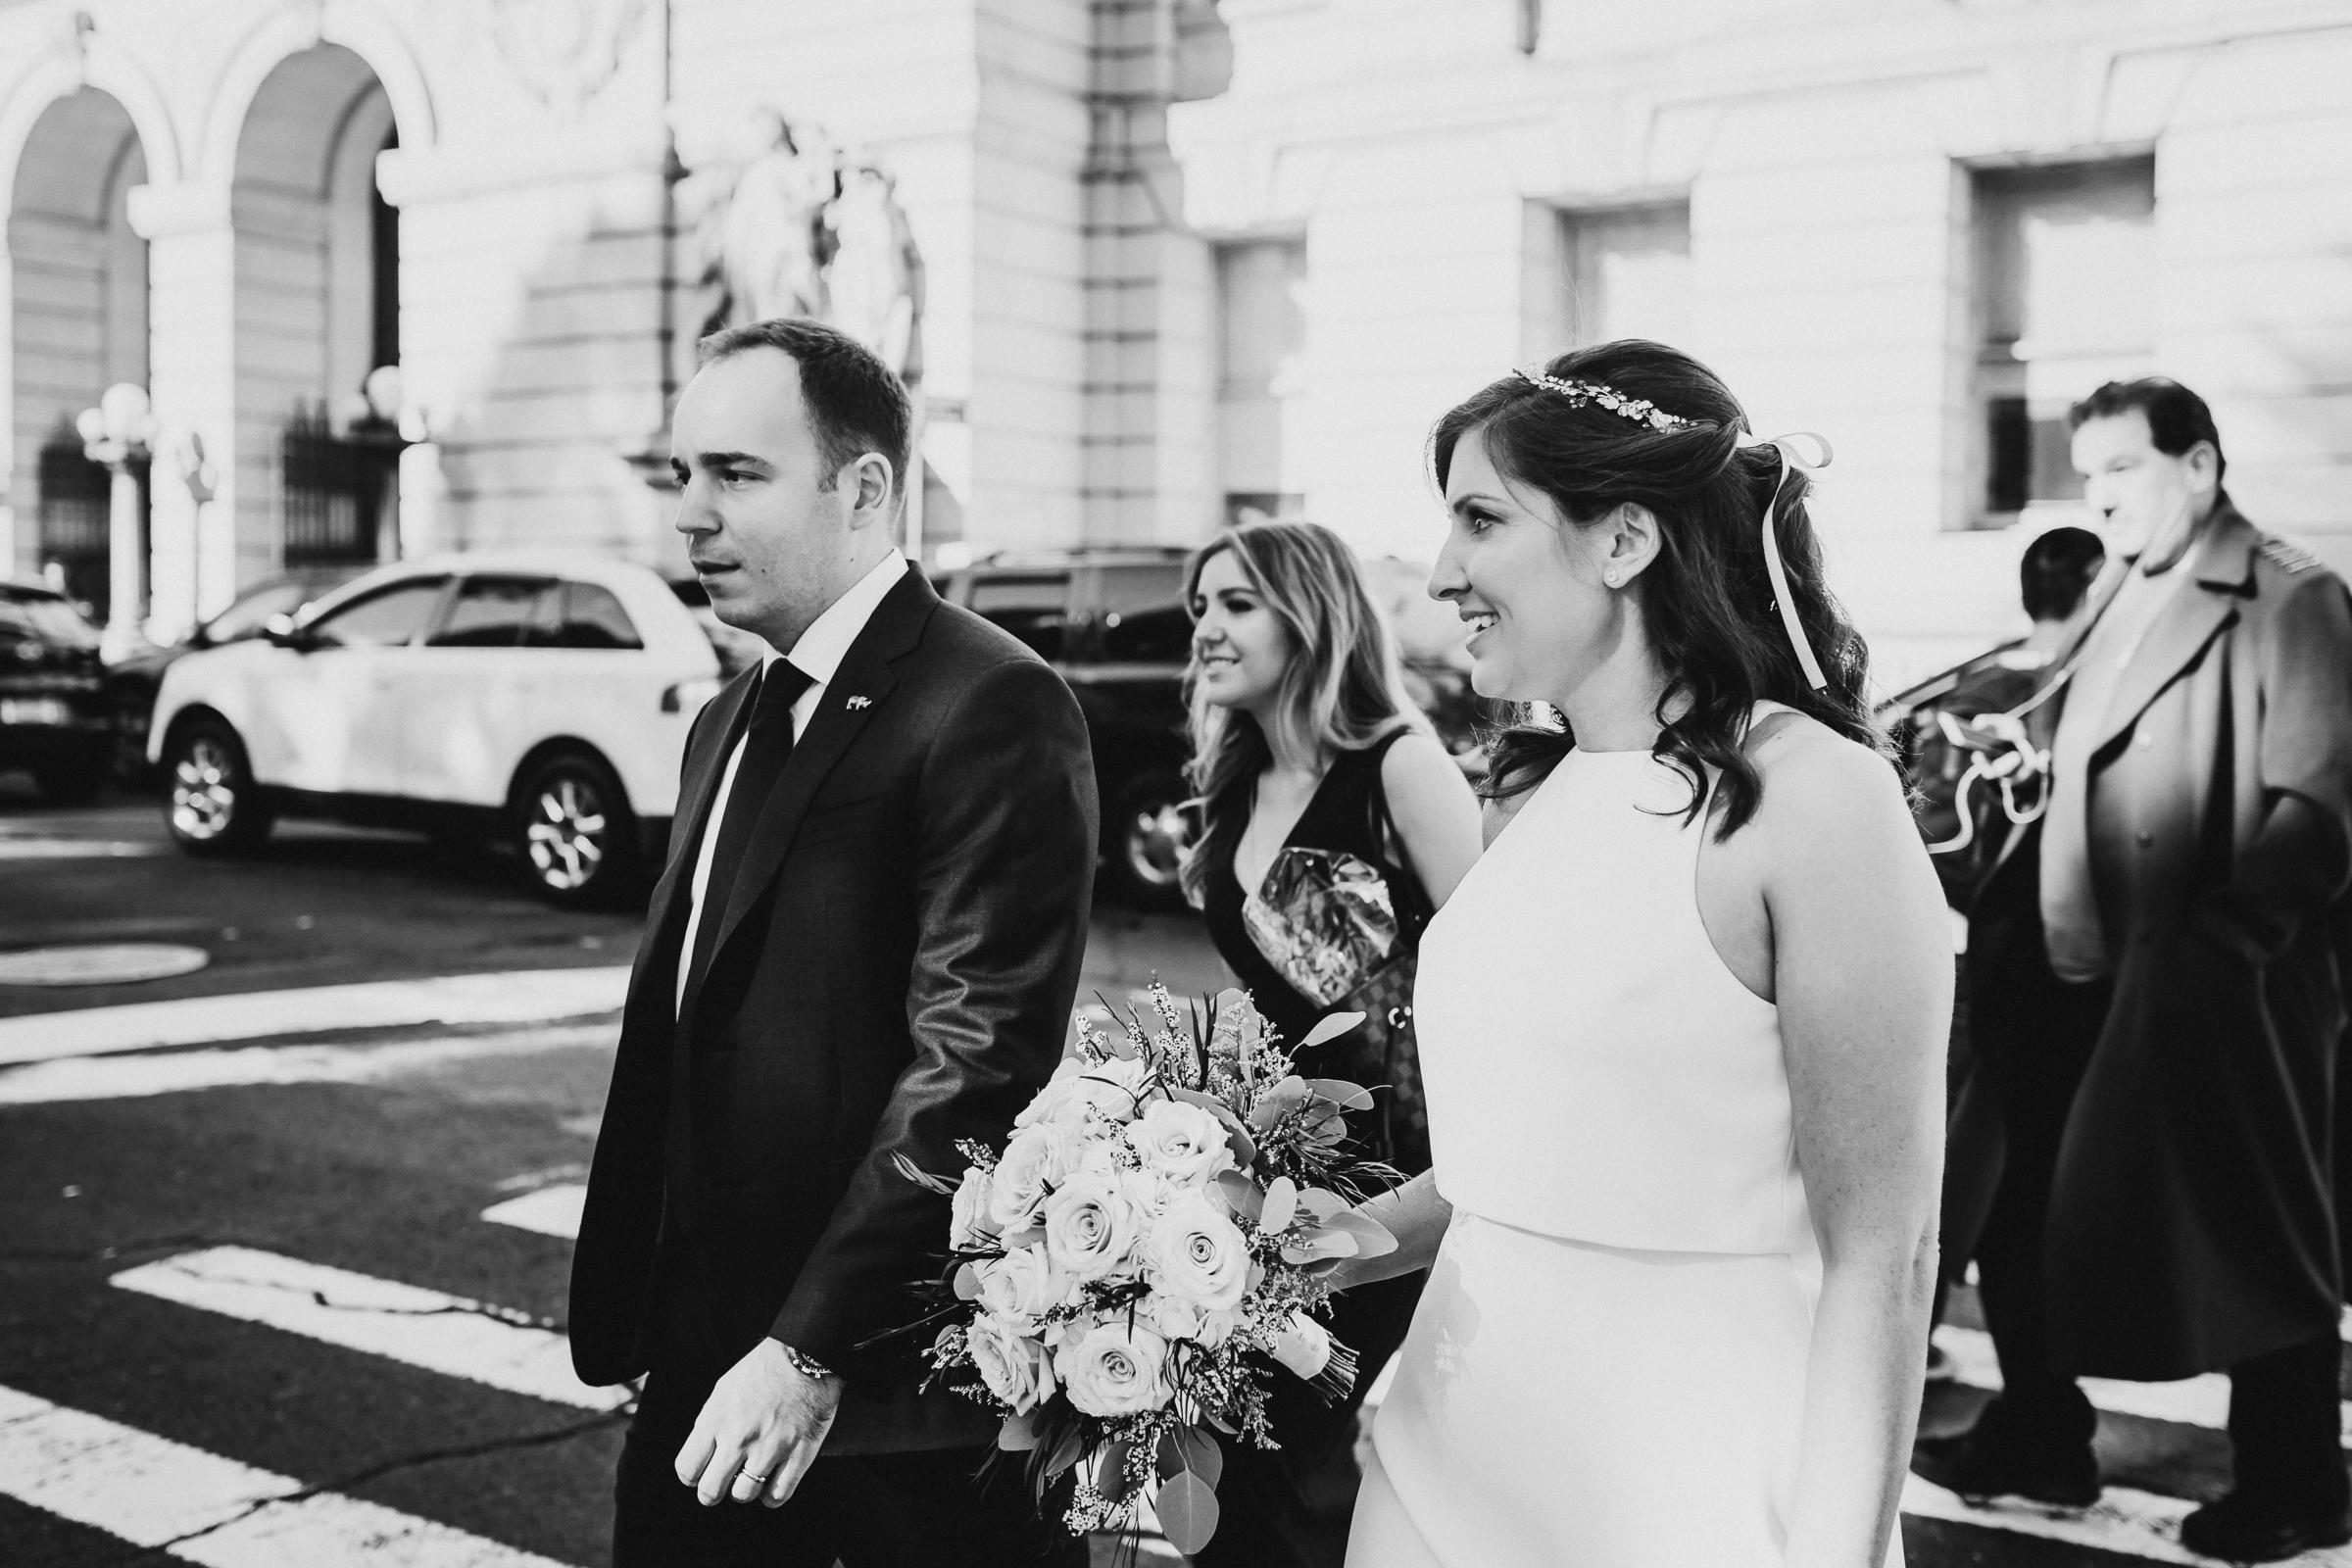 Casa-Apicii-Intimate-Wedding-City-Hall-Elopement-New-York-Documentary-Wedding-Photographer-19.jpg